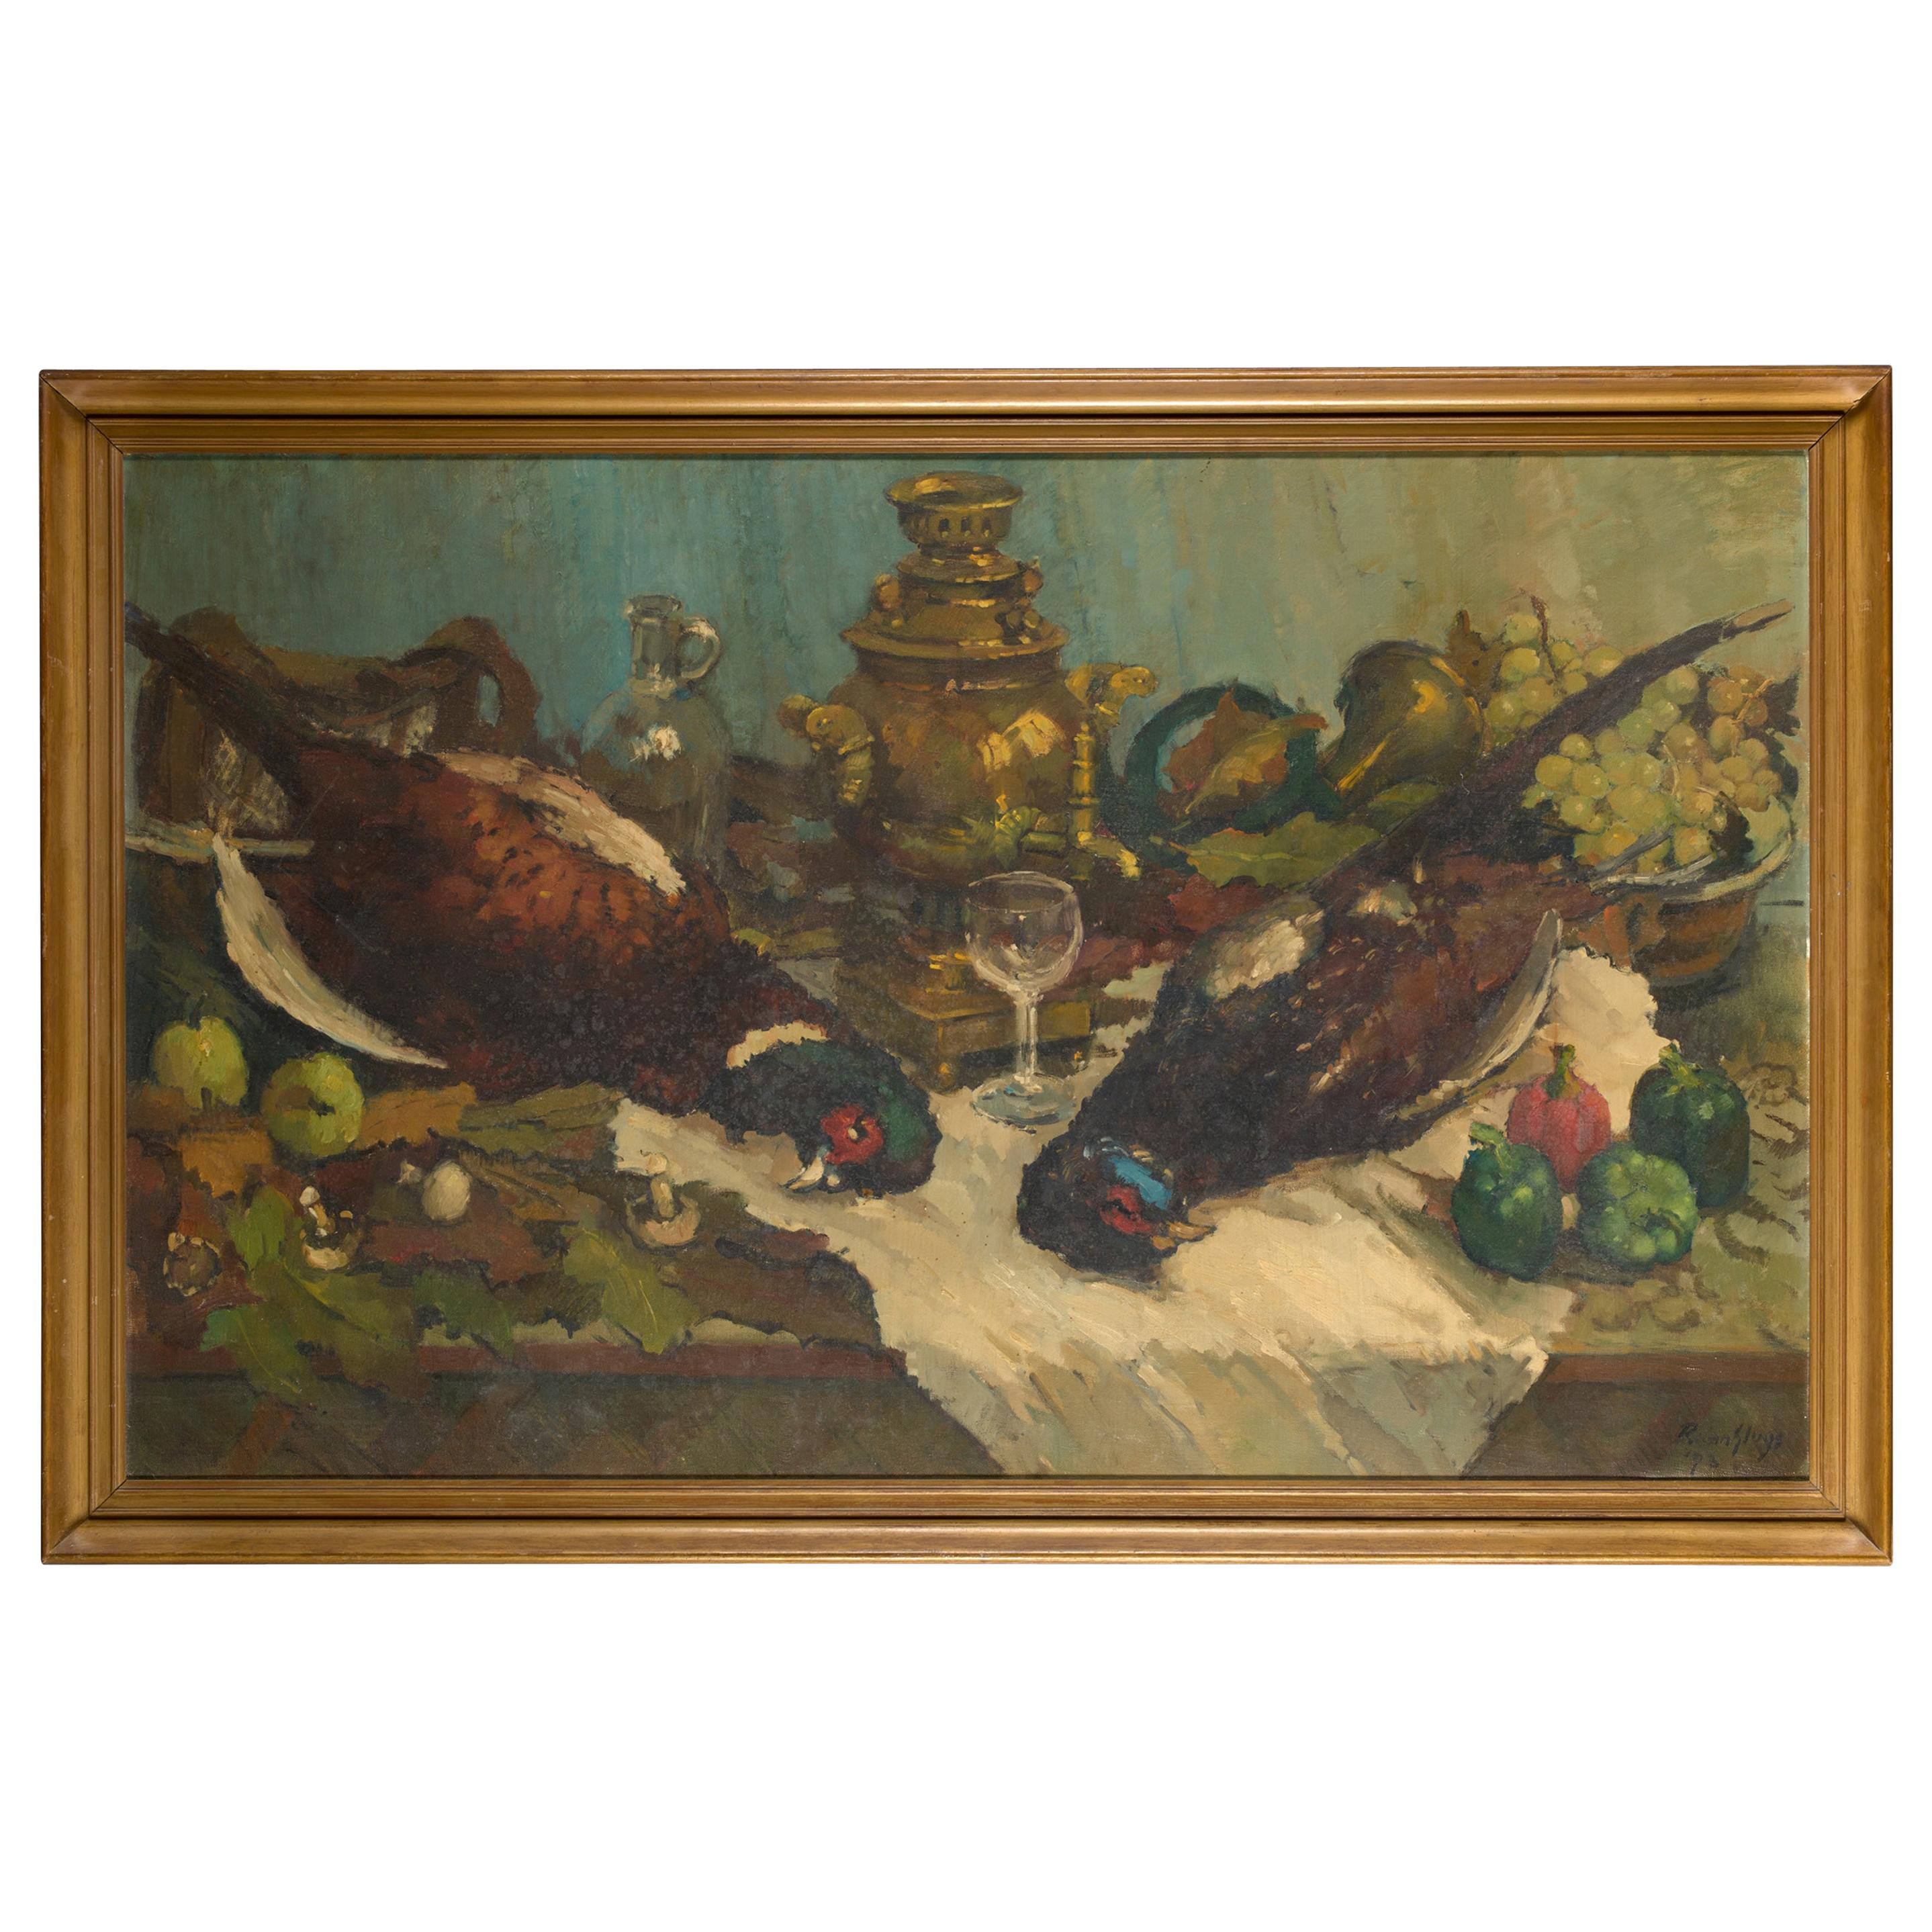 Remy Van Sluys, Still Life After the Hunt, Oil on Canvas, Framed